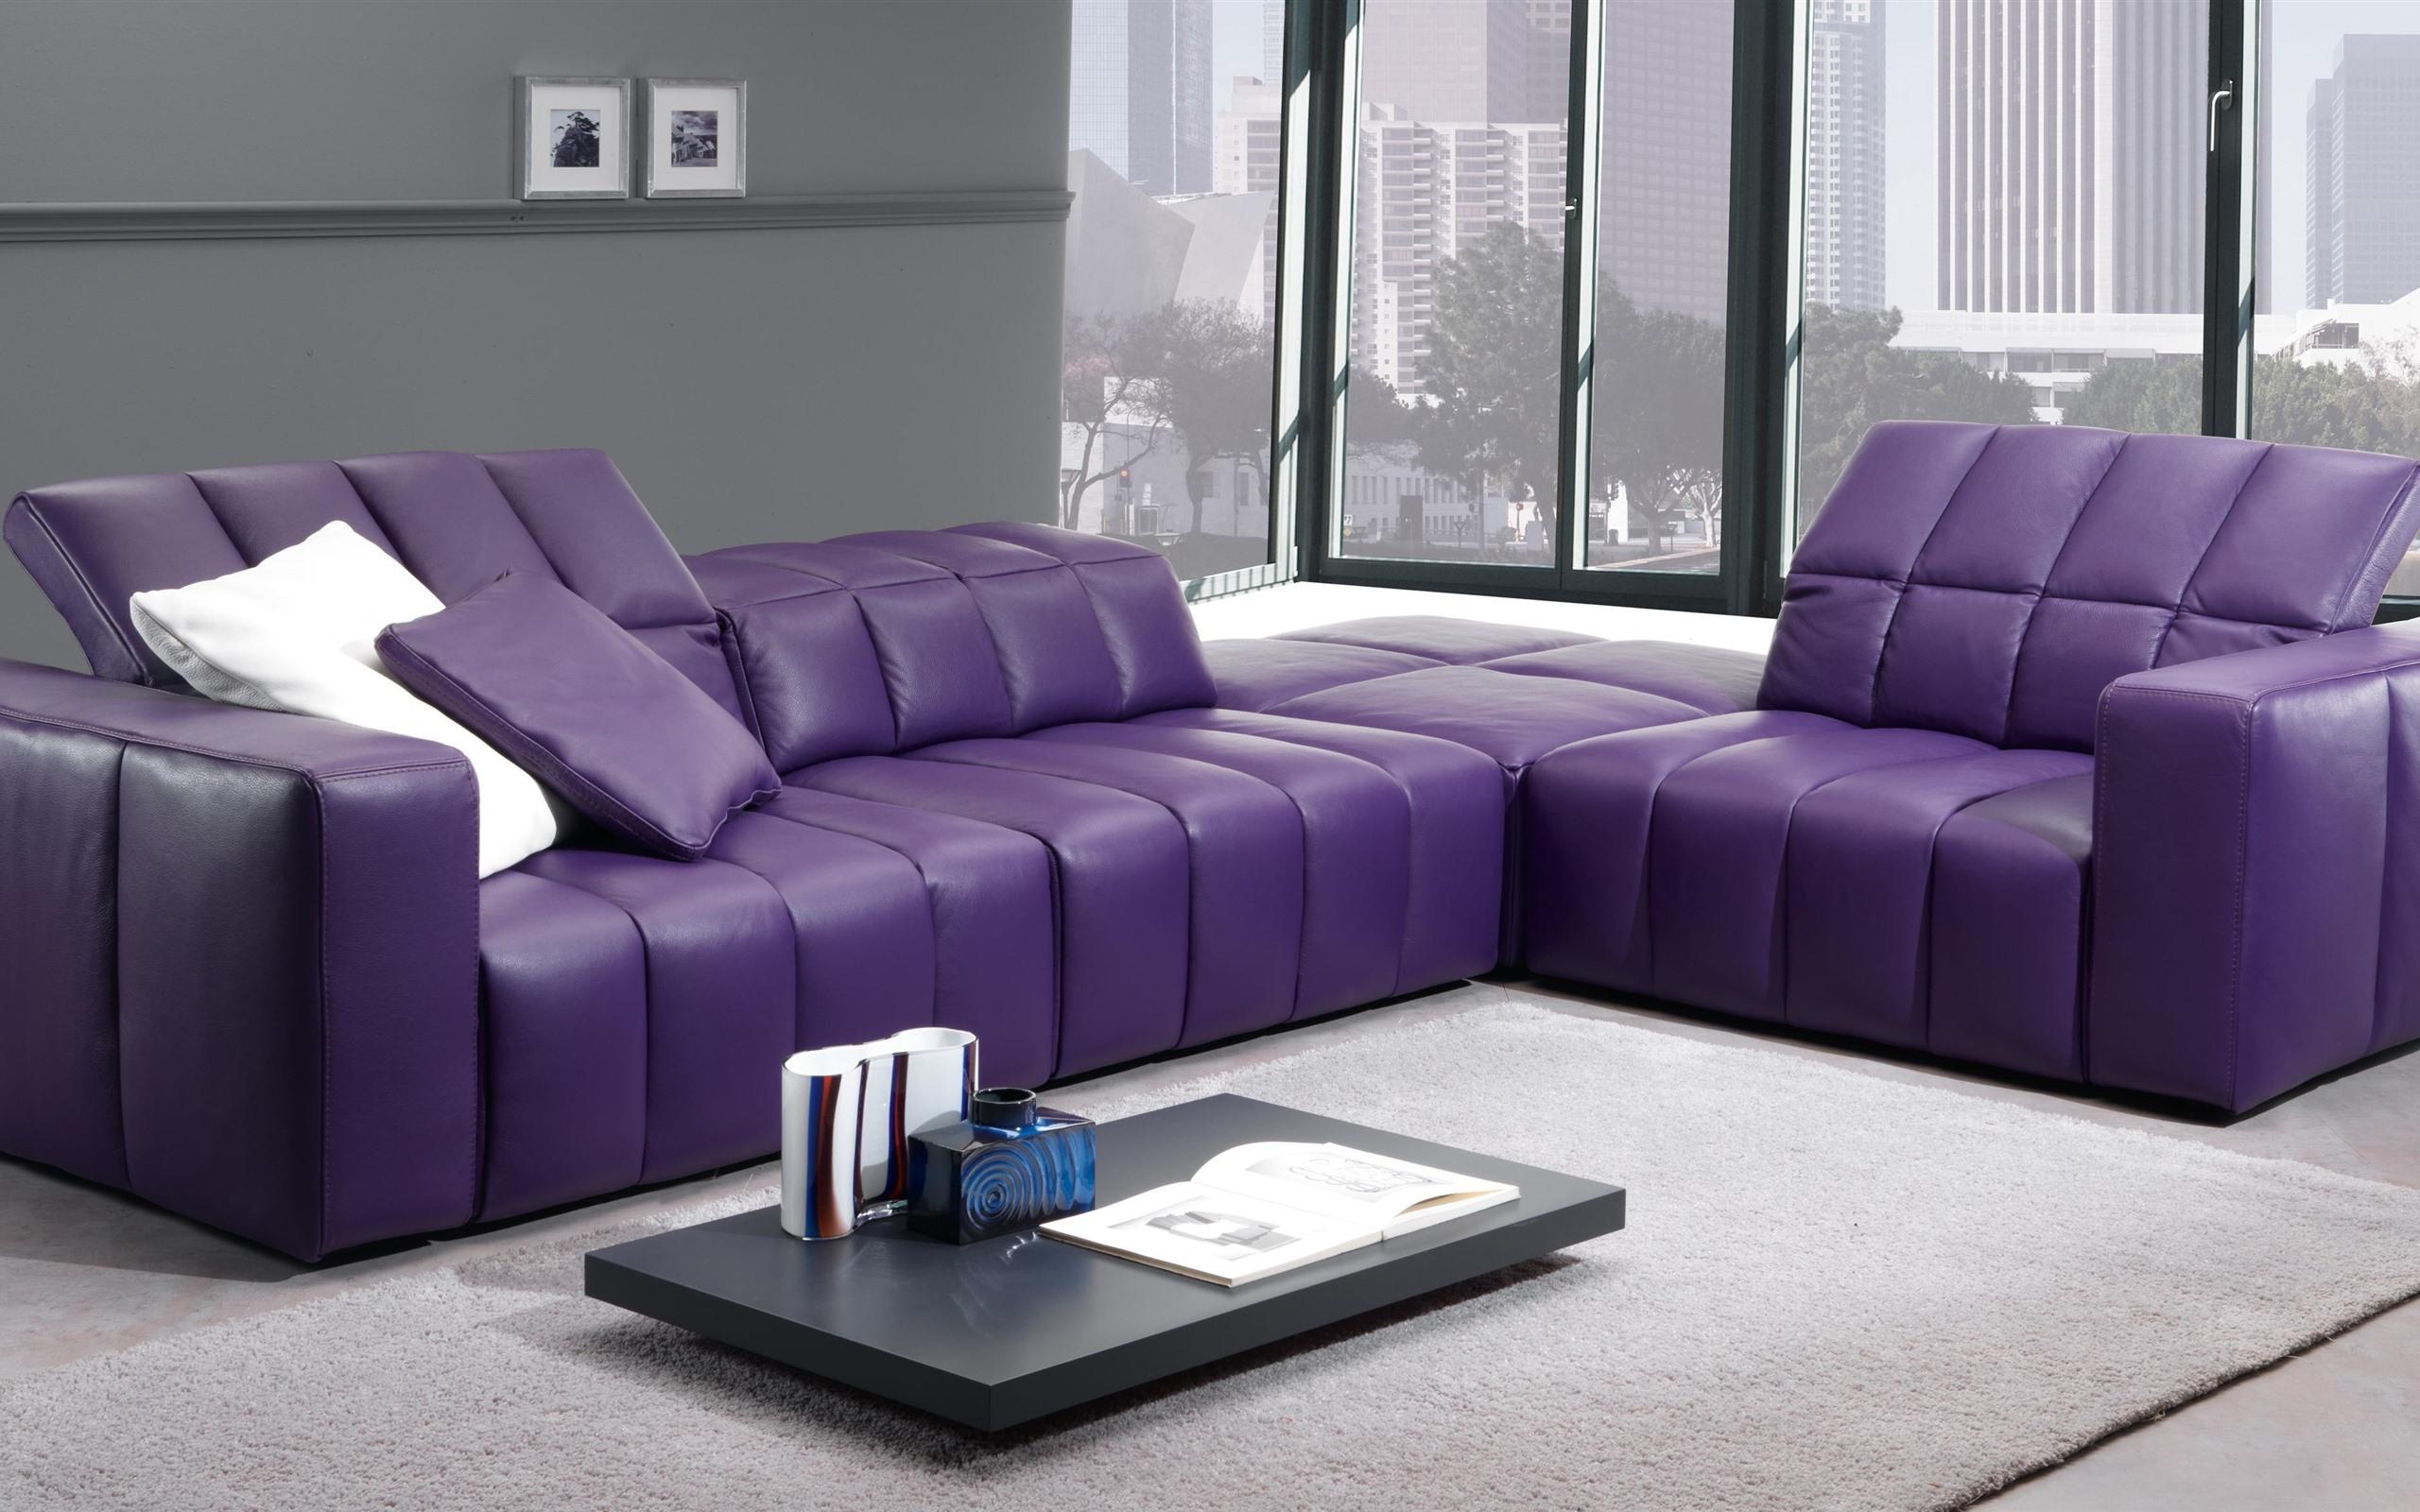 Wallpaper Living Room Purple Sofa Window 3840x2160 Uhd